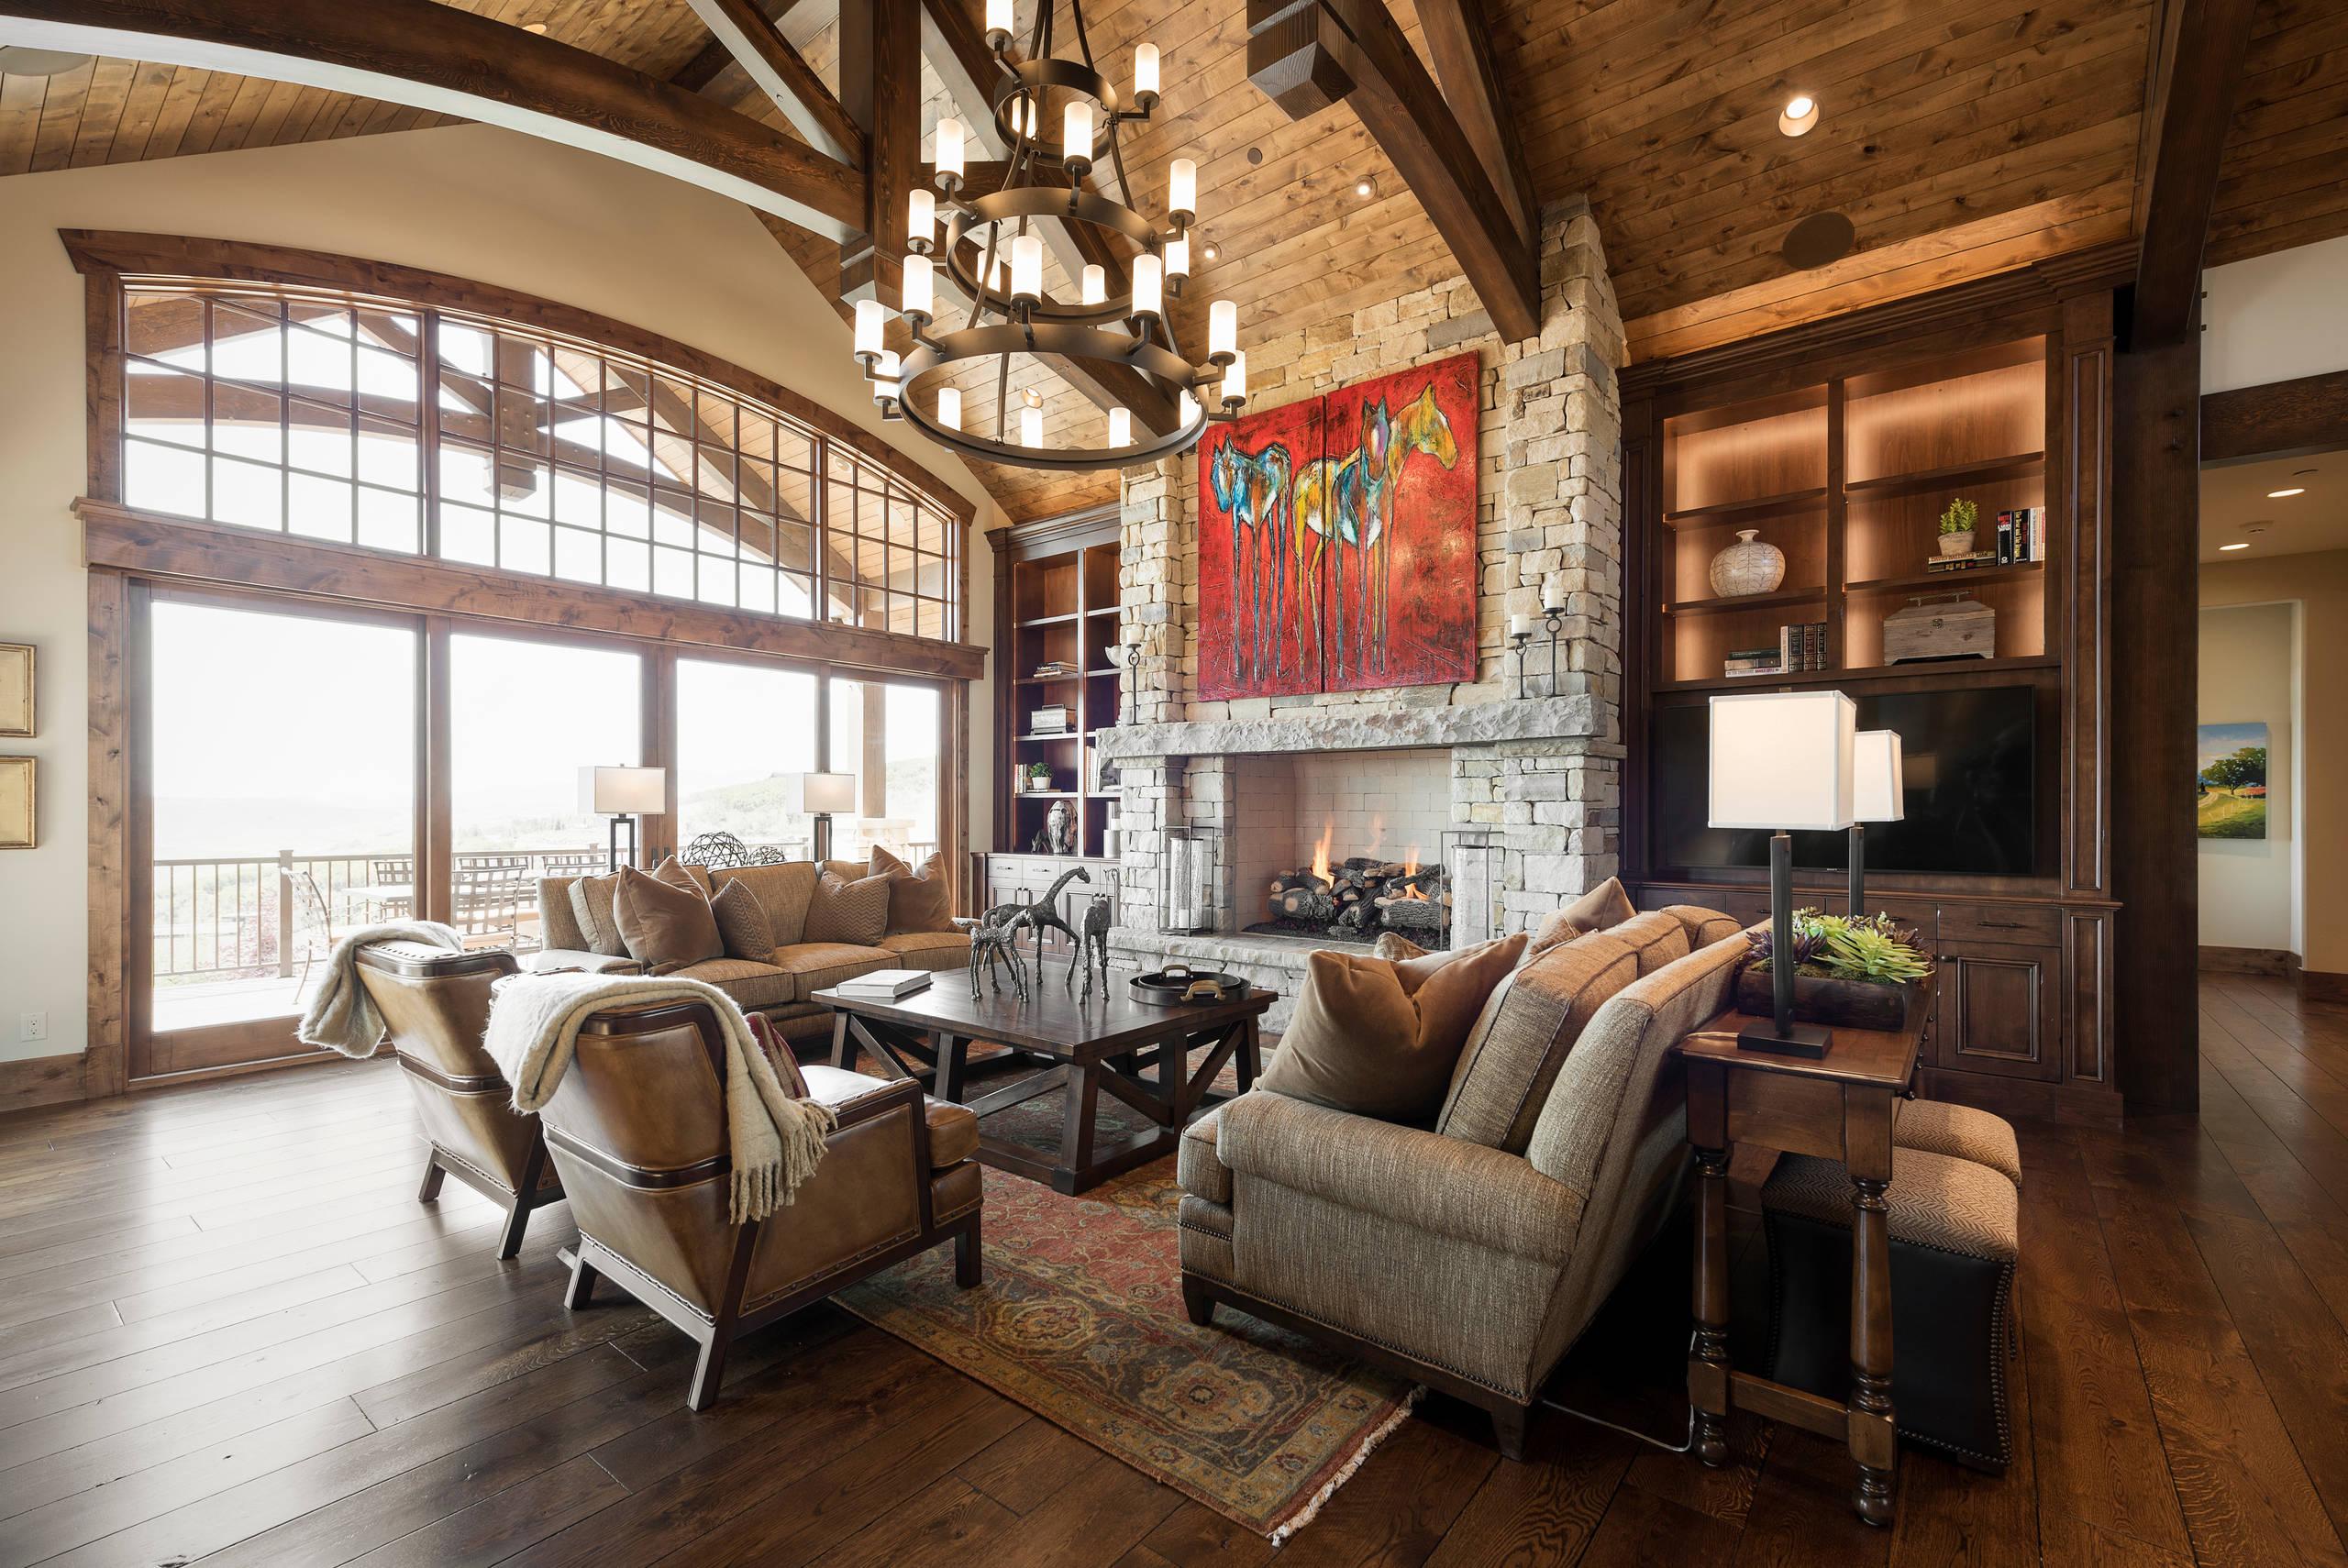 2014 Park City Area Showcase of Homes - Promontory, Utah